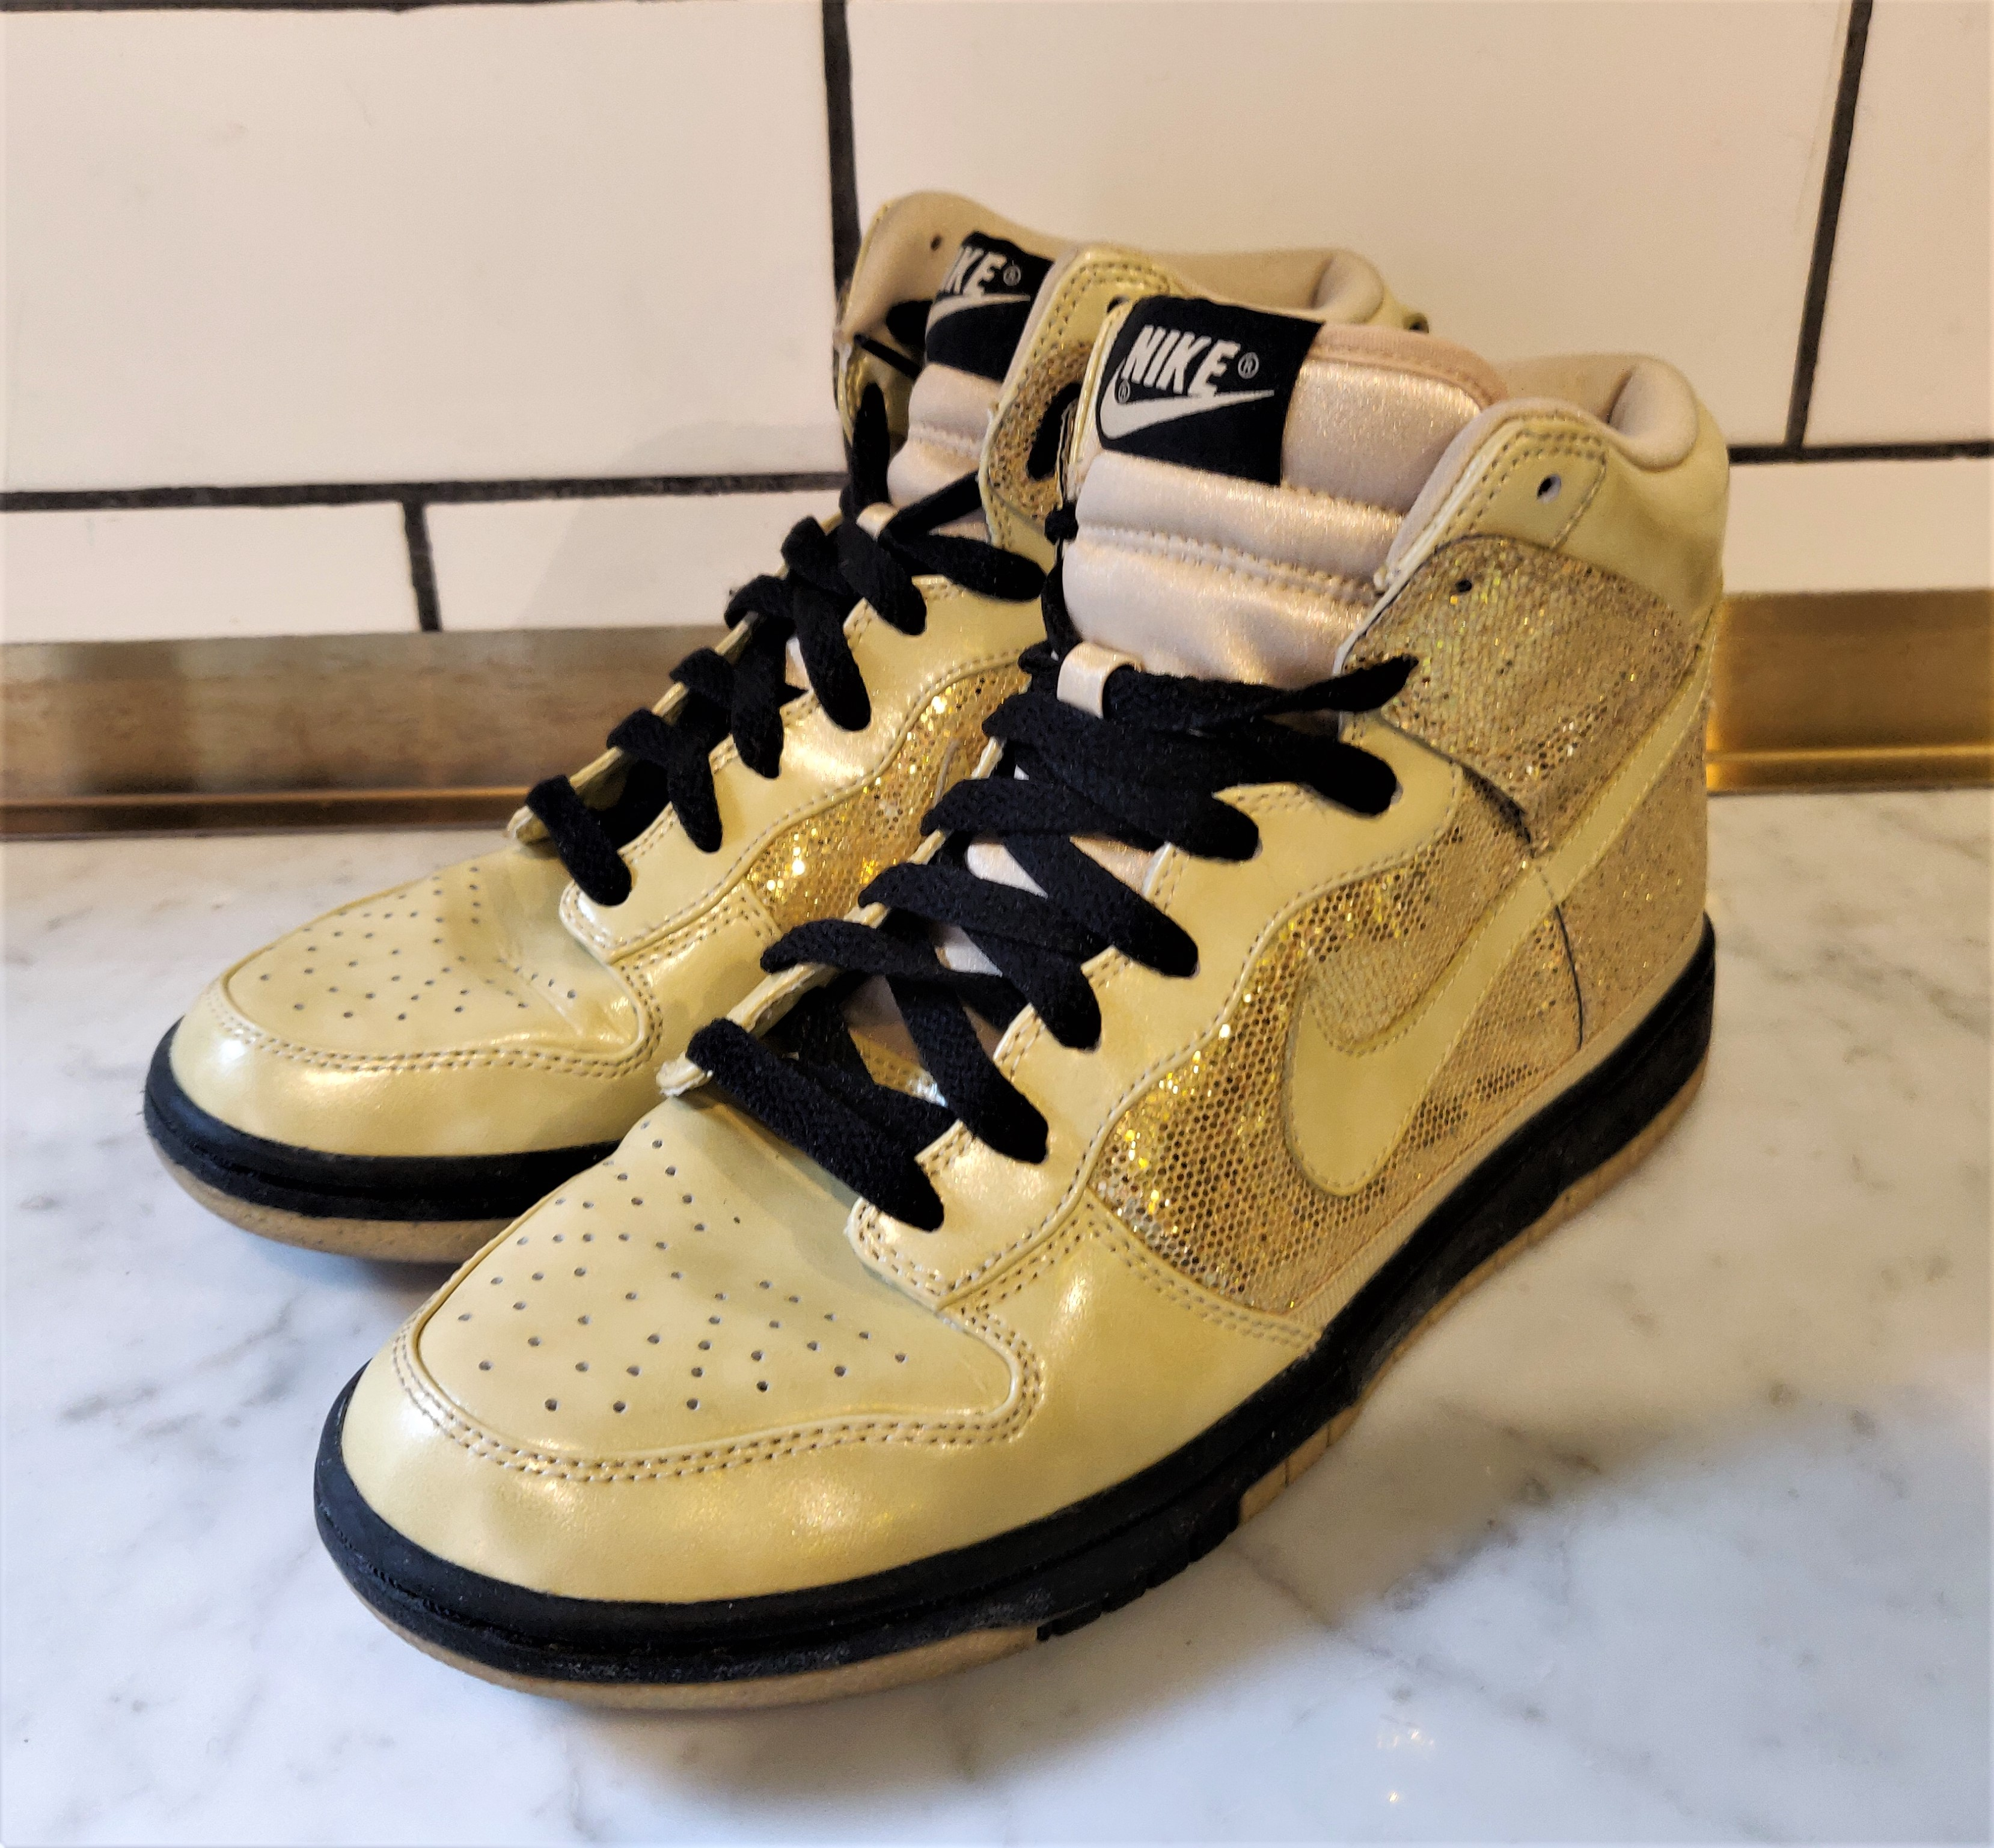 Nike Metallic Gold Dunk High